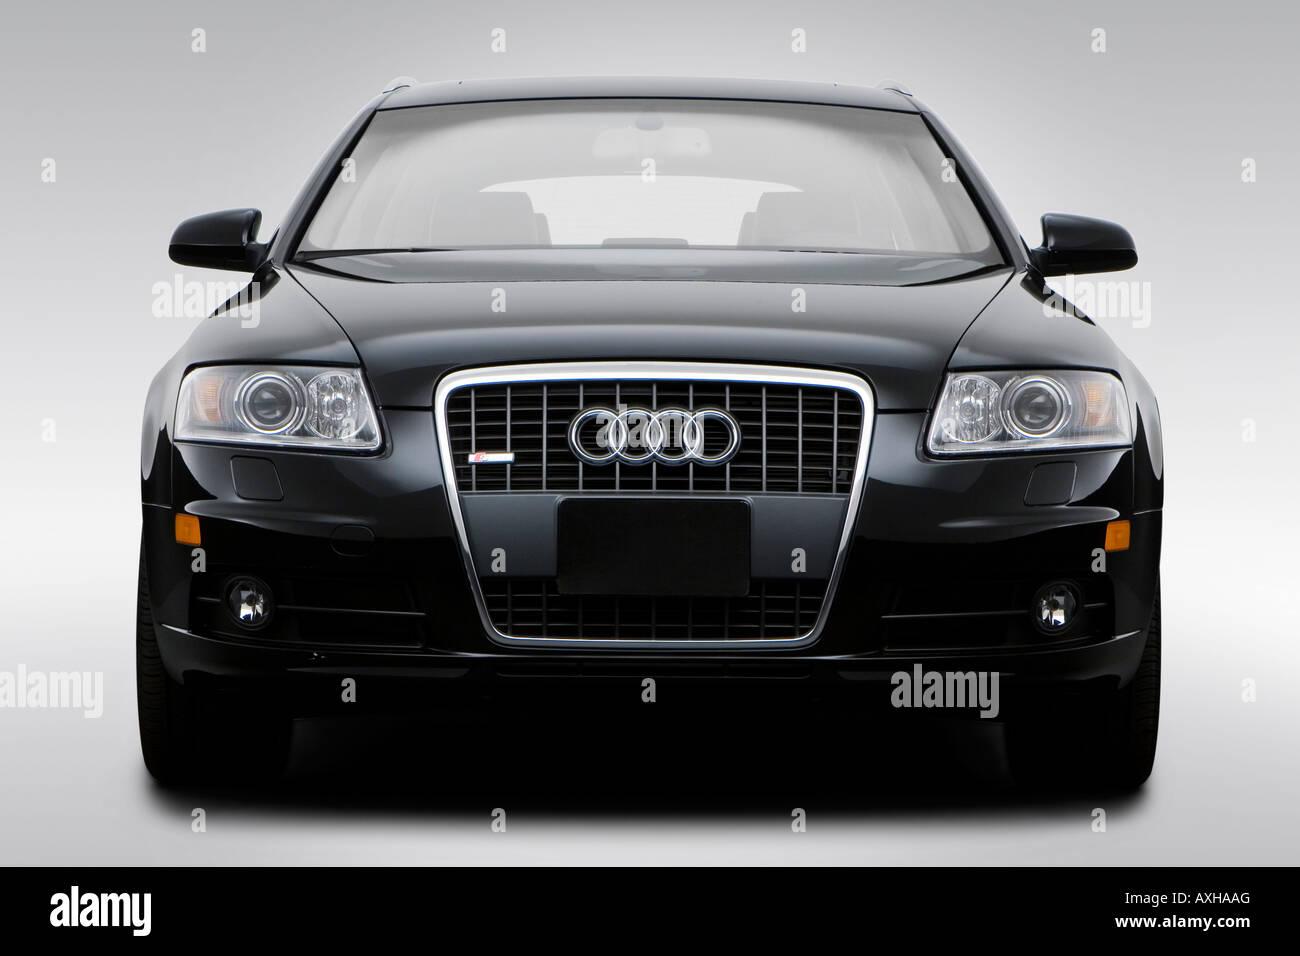 2008 Audi A6 Avant 3.2 FSI quattro in Black - Low/Wide Front Stock Audi A Black Lights on audi from lights, audi swarm lights, audi a5 lights, audi s3 lights, bmw 3 series lights, lexus gs 350 lights, land rover 110 lights, audi s7 lights, jaguar s type lights, audi service lights, bmw 5 series lights, land rover lr3 lights, ford super duty lights, ford ranger lights, bmw 7 series lights, acura tl lights, audi q headlights, saab 9-2x lights, nissan altima lights, hyundai sonata lights,